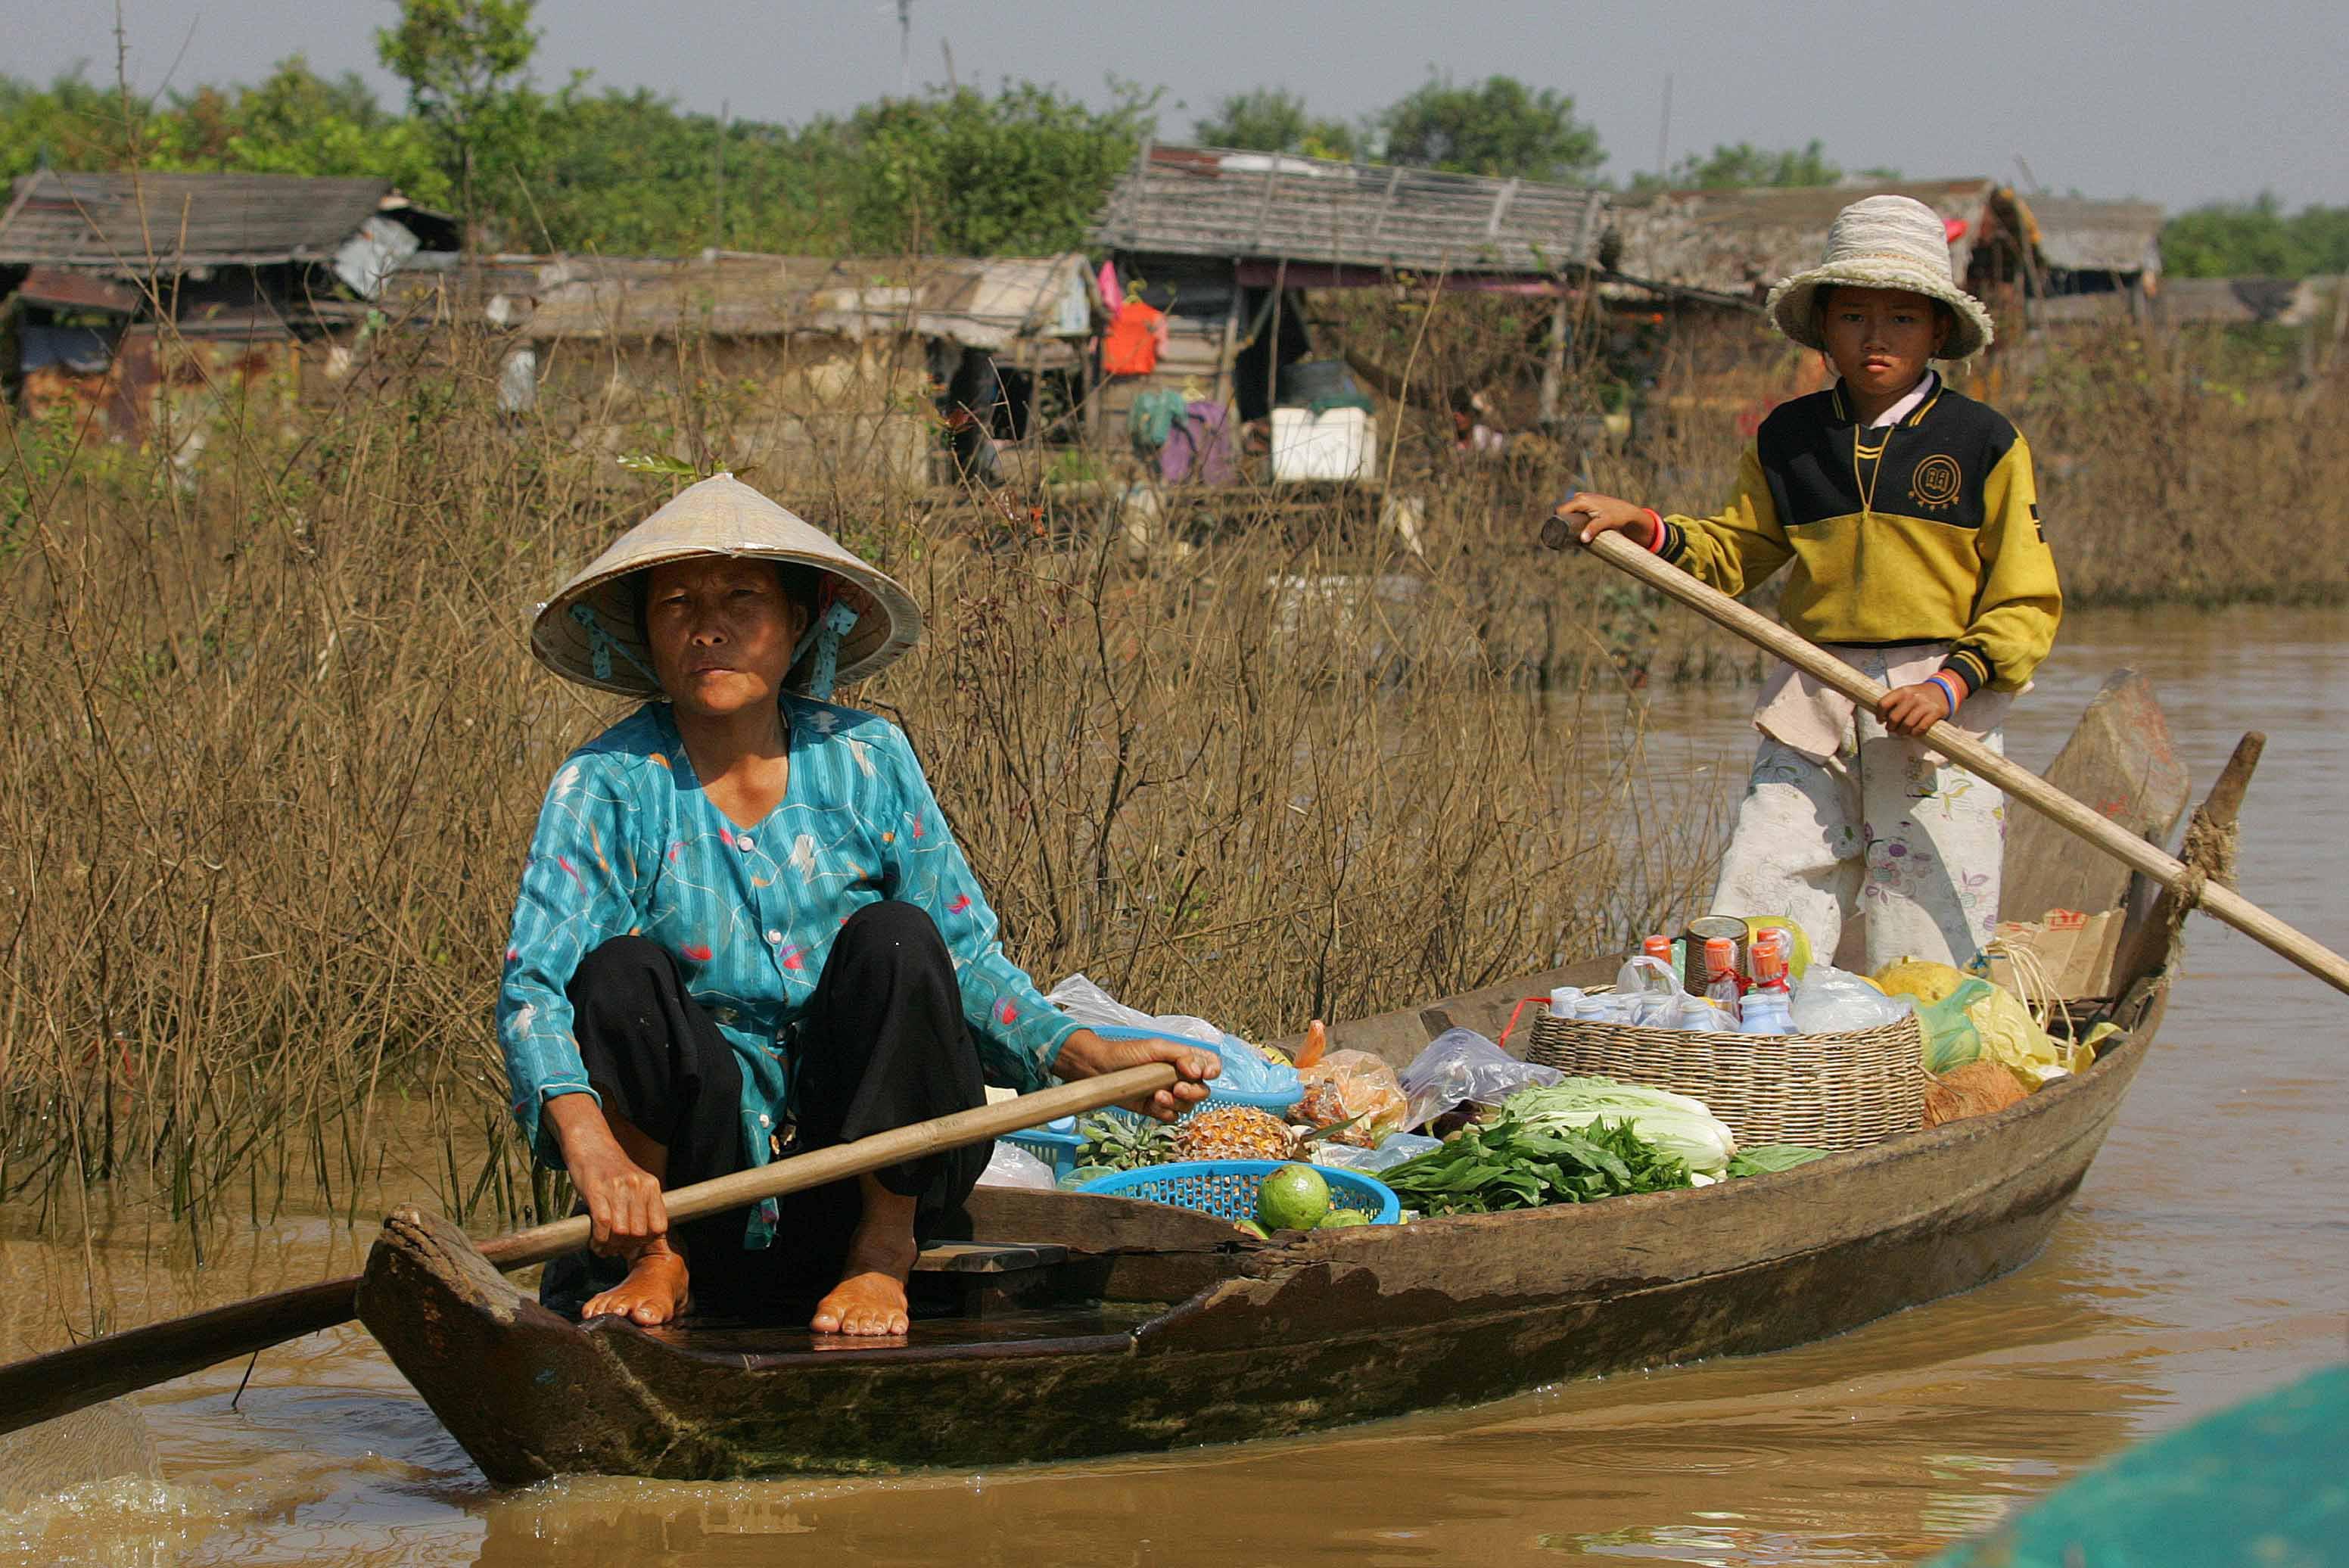 photographies du cambodge temples d 39 angkor banque d 39 images photos d 39 angkor gratuite. Black Bedroom Furniture Sets. Home Design Ideas